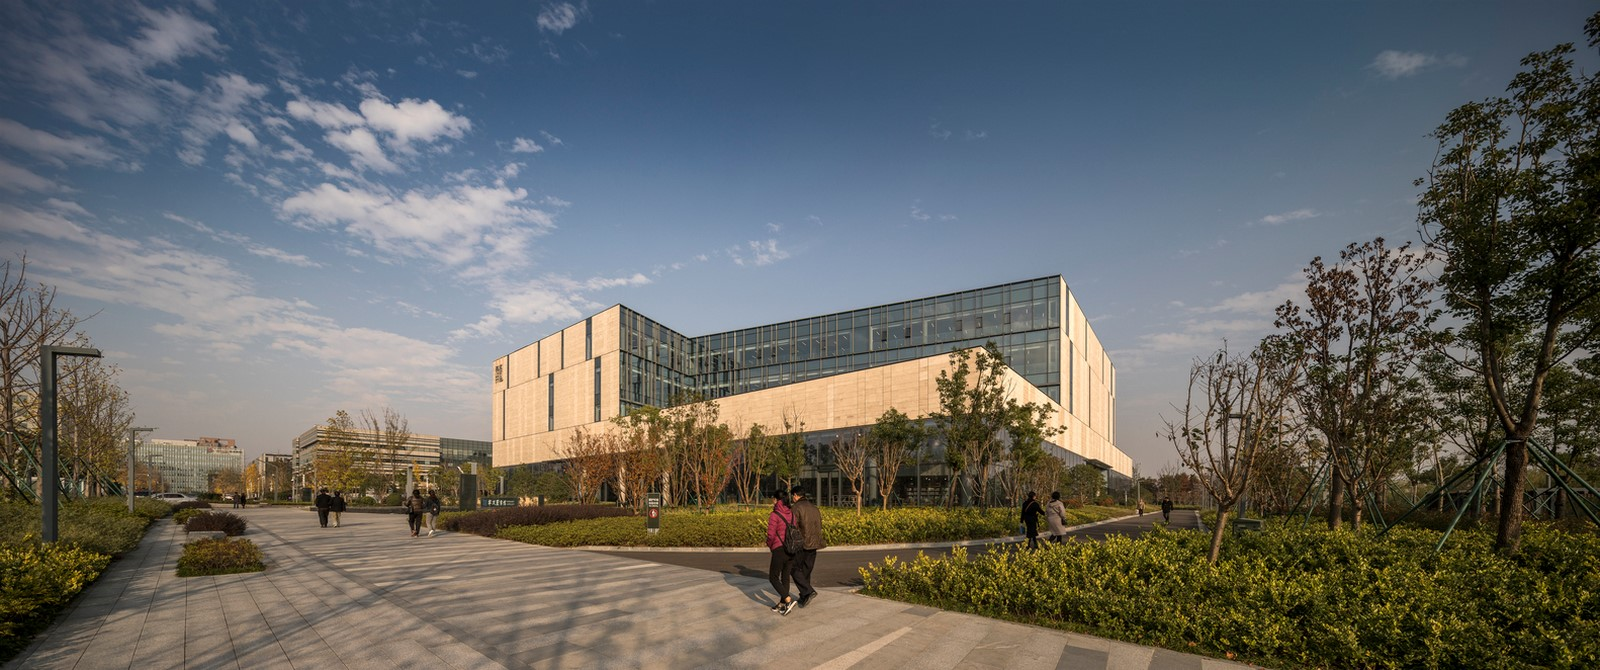 Ningbo New Library, China Sheet1